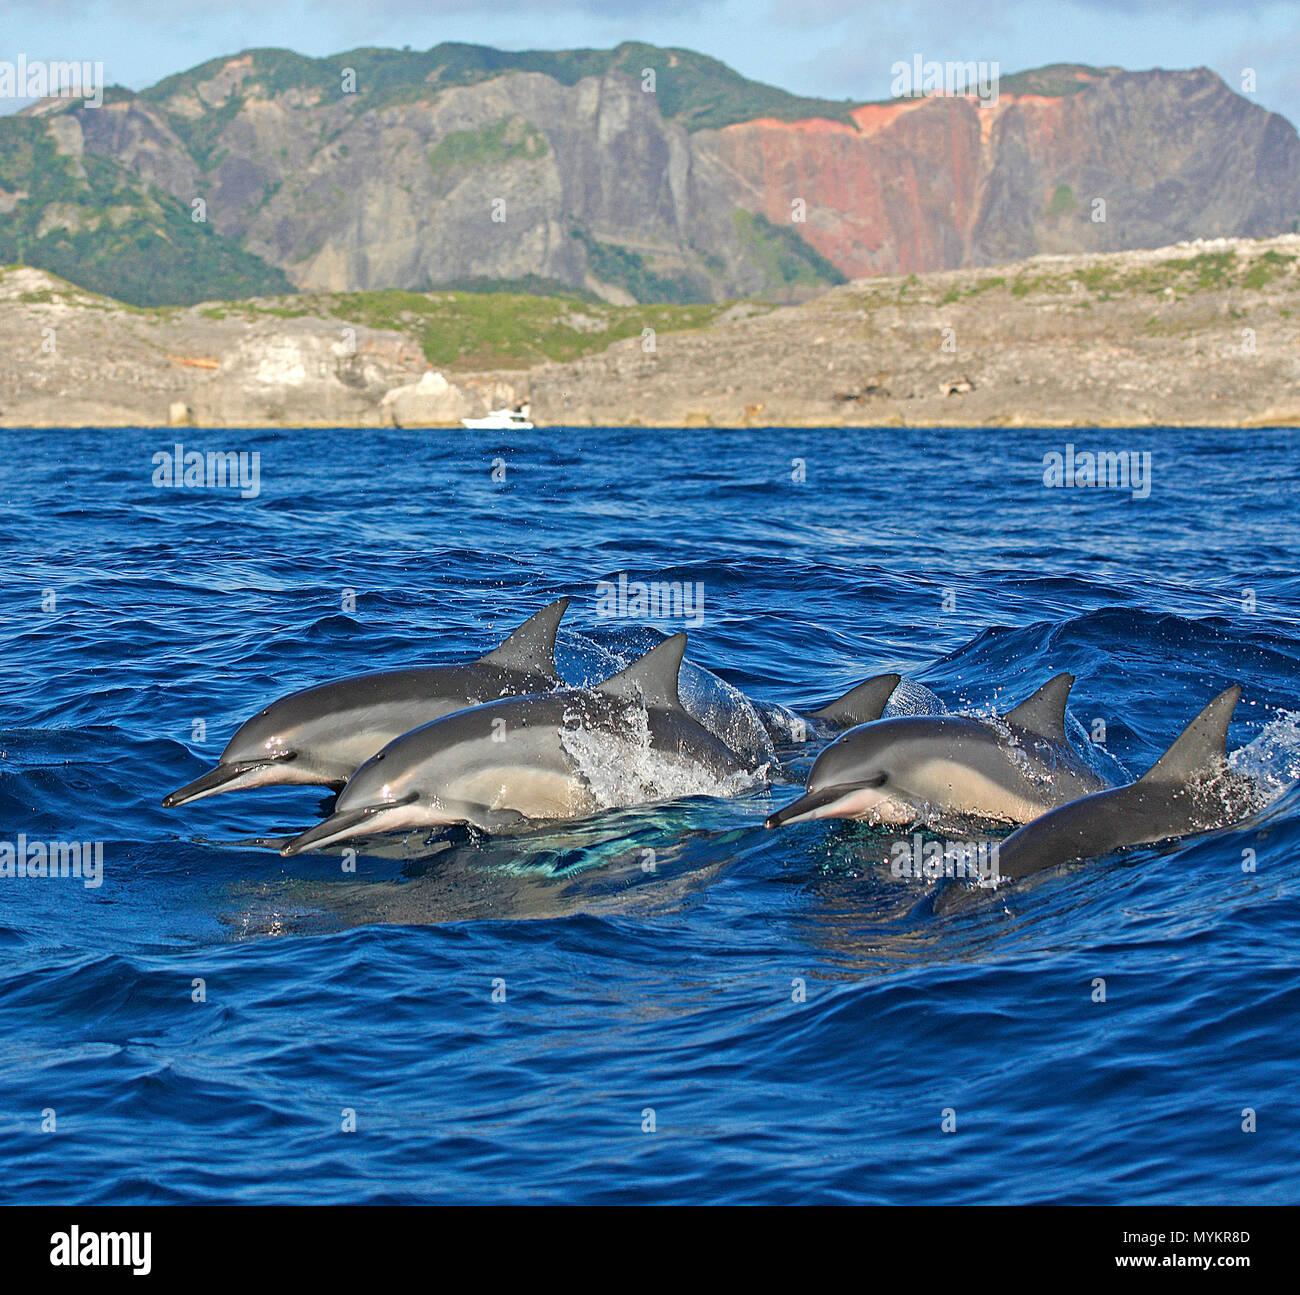 Spinner dolphins (Stenella longirostris), jumping, Ogasawara Islands, Japan - Stock Image